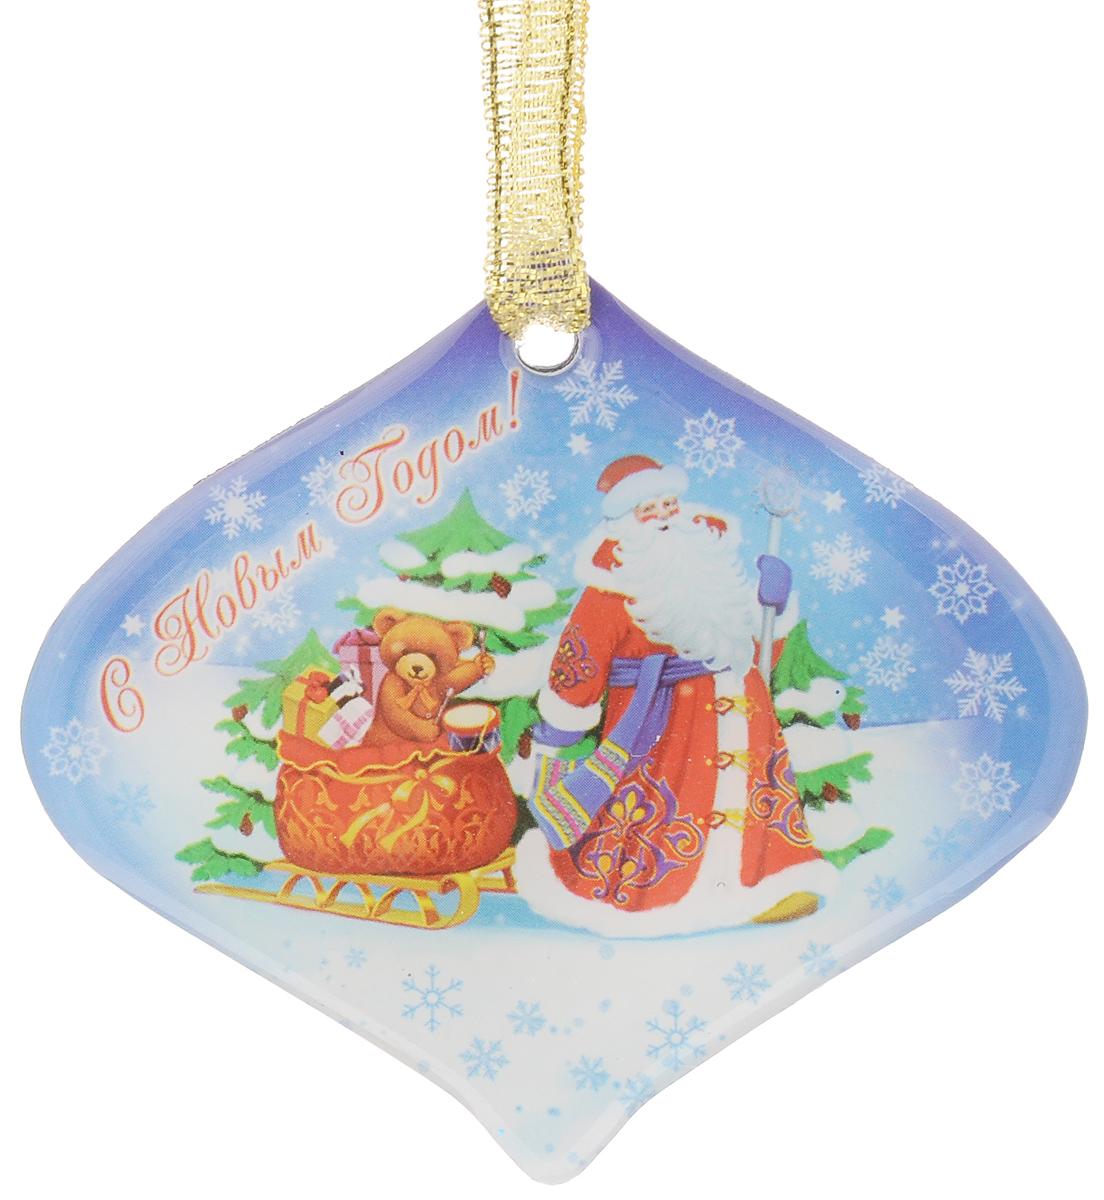 "Магнит декоративный Magic Time ""Дед мороз с мишкой в санях"", 6,6 х 6 см 38365"